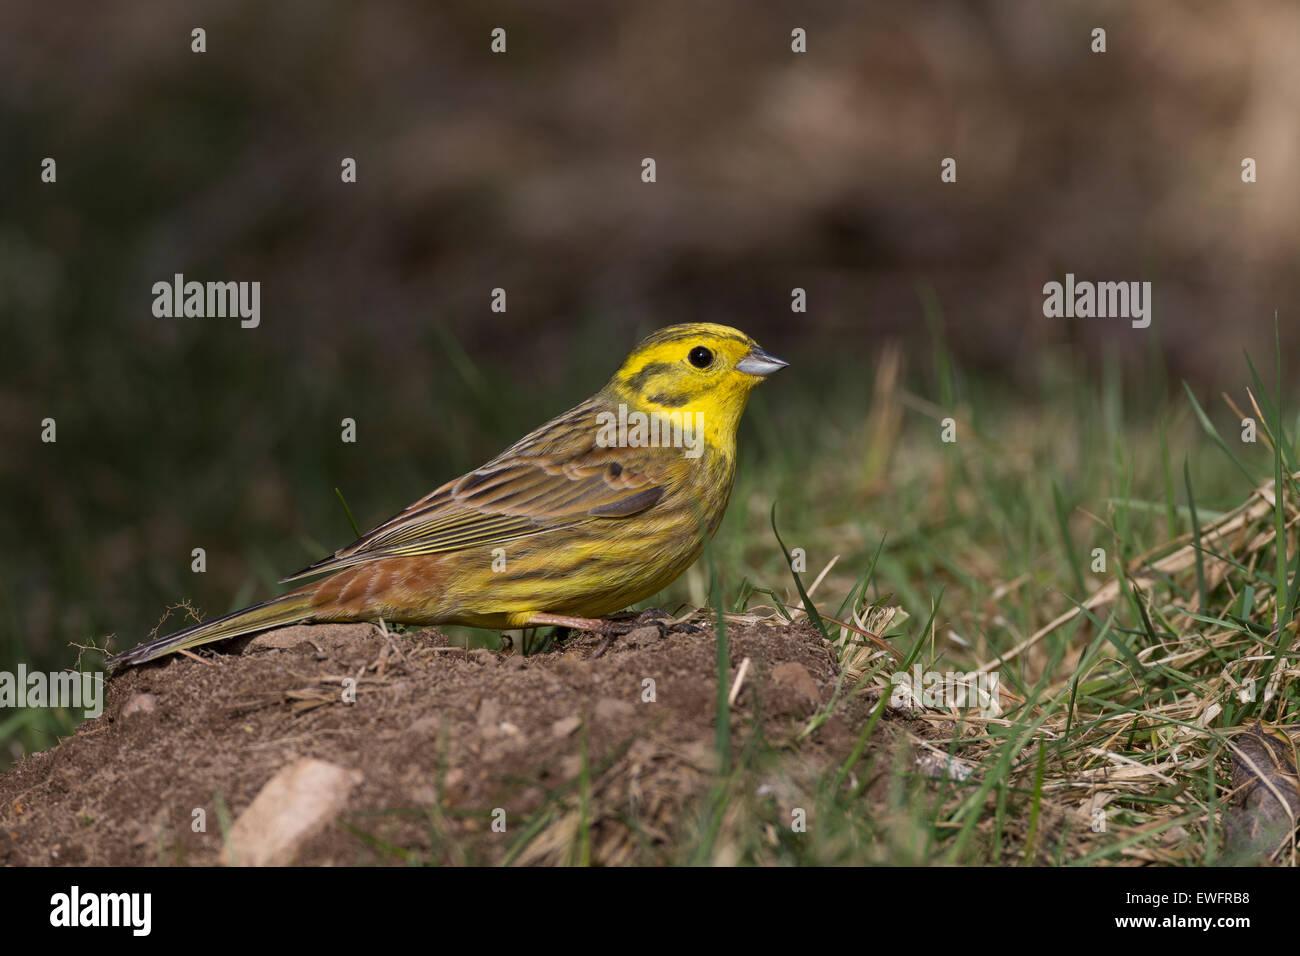 Yellowhammer, Goldammer, Gold-Ammer, Ammer, Emberiza citrinella, Le Bruant jaune - Stock Image